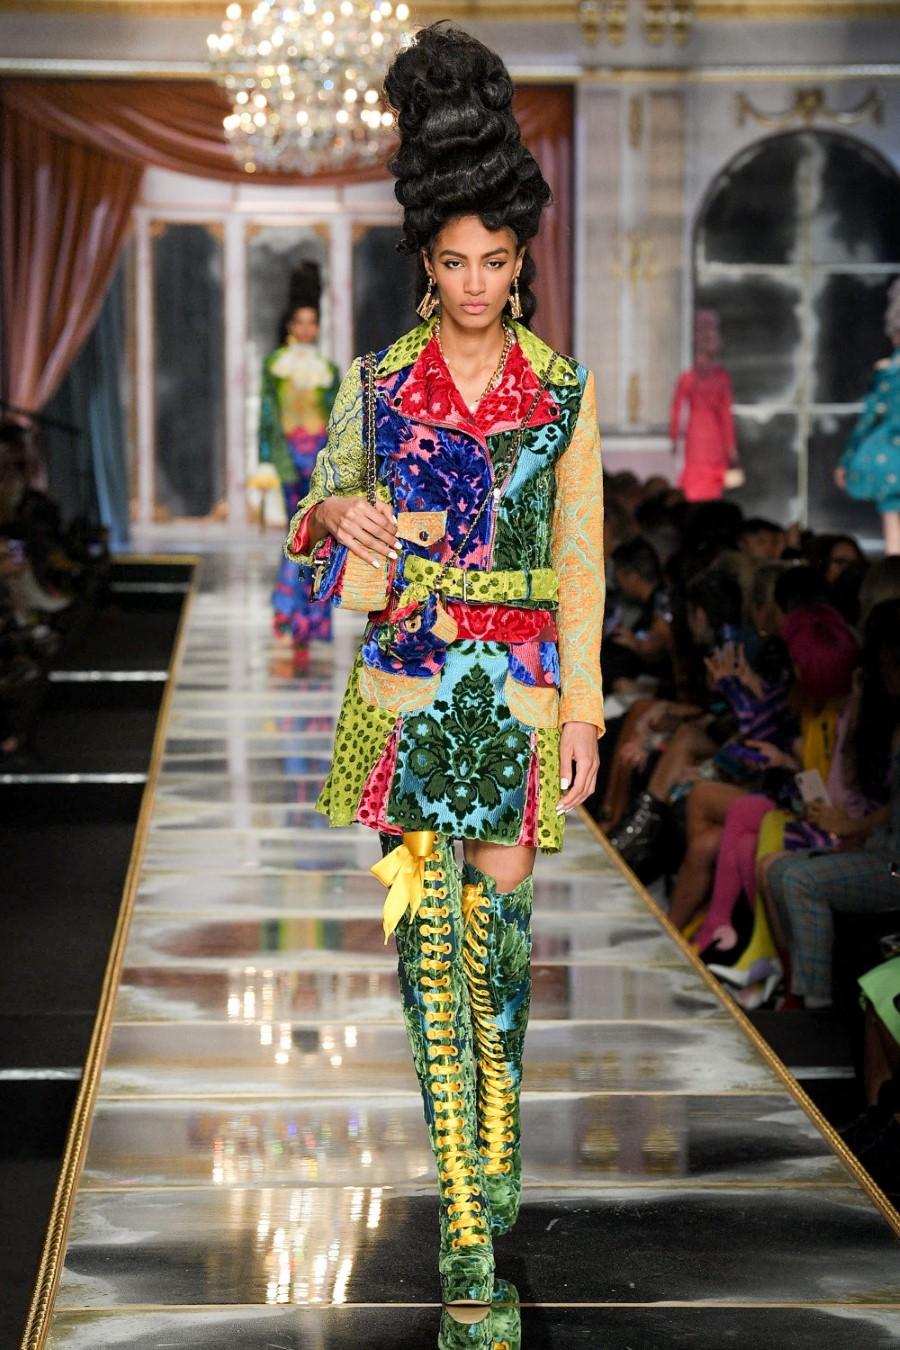 Moschino - Fall Winter 2020 - Milan Fashion WeekMoschino - Fall Winter 2020 - Milan Fashion Week